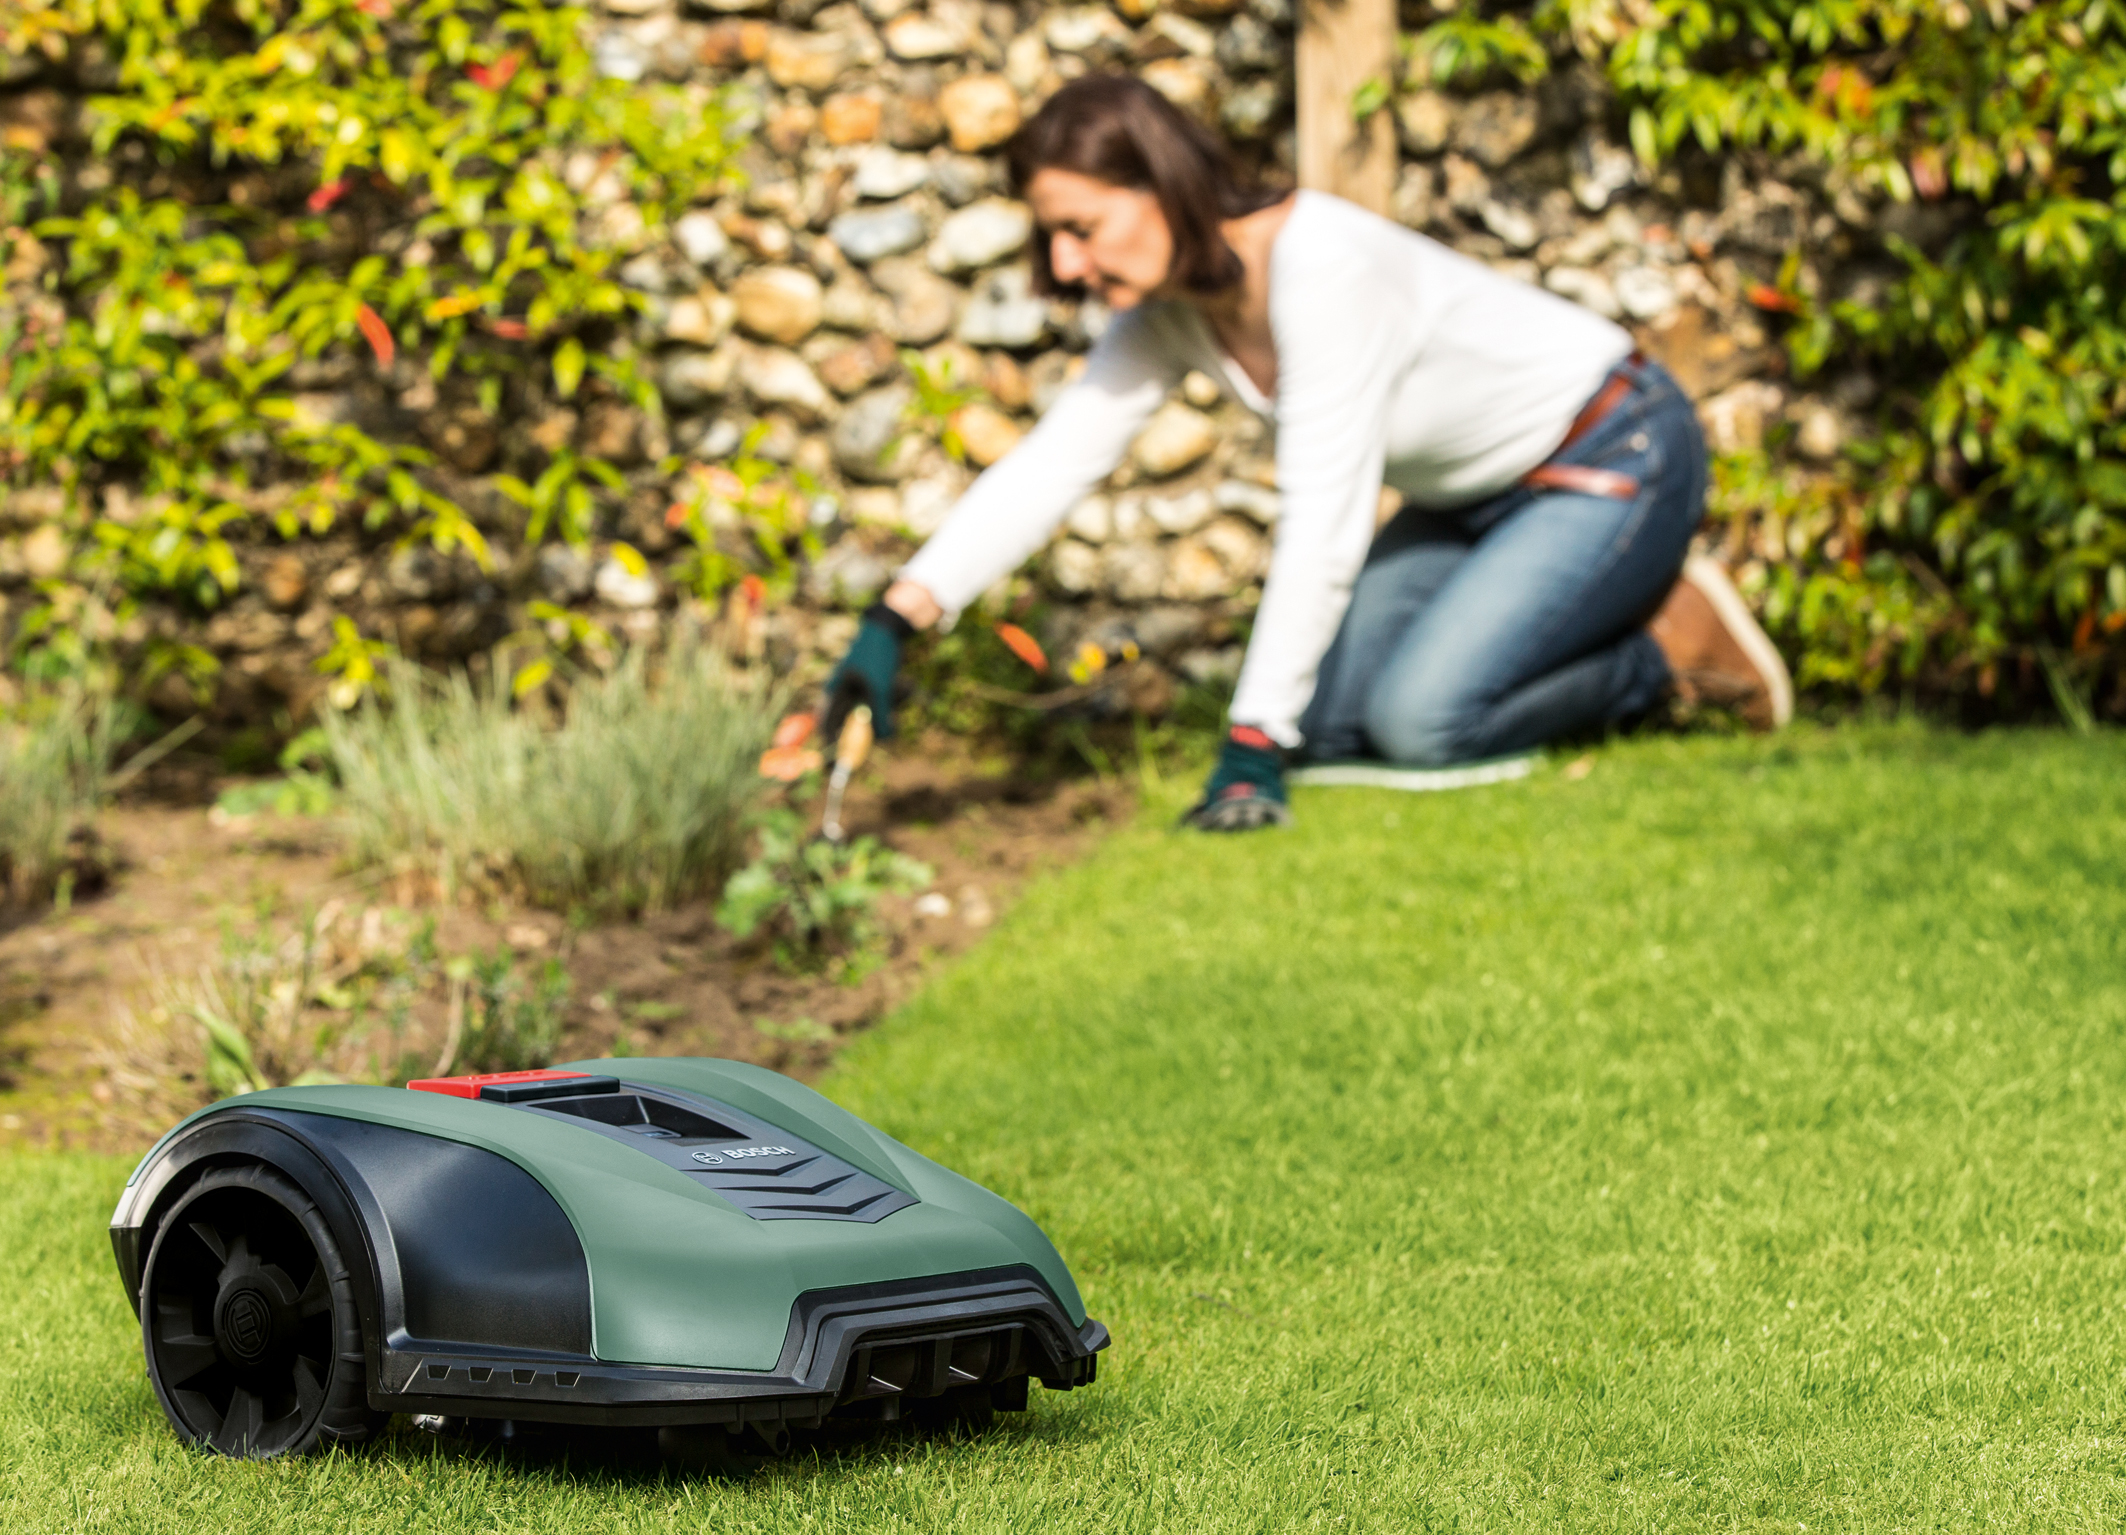 Unikátne vďaka autonómnemu meraniu plochy trávnika: Robotické kosačky Bosch Indego M 700 a Indego M+ 700